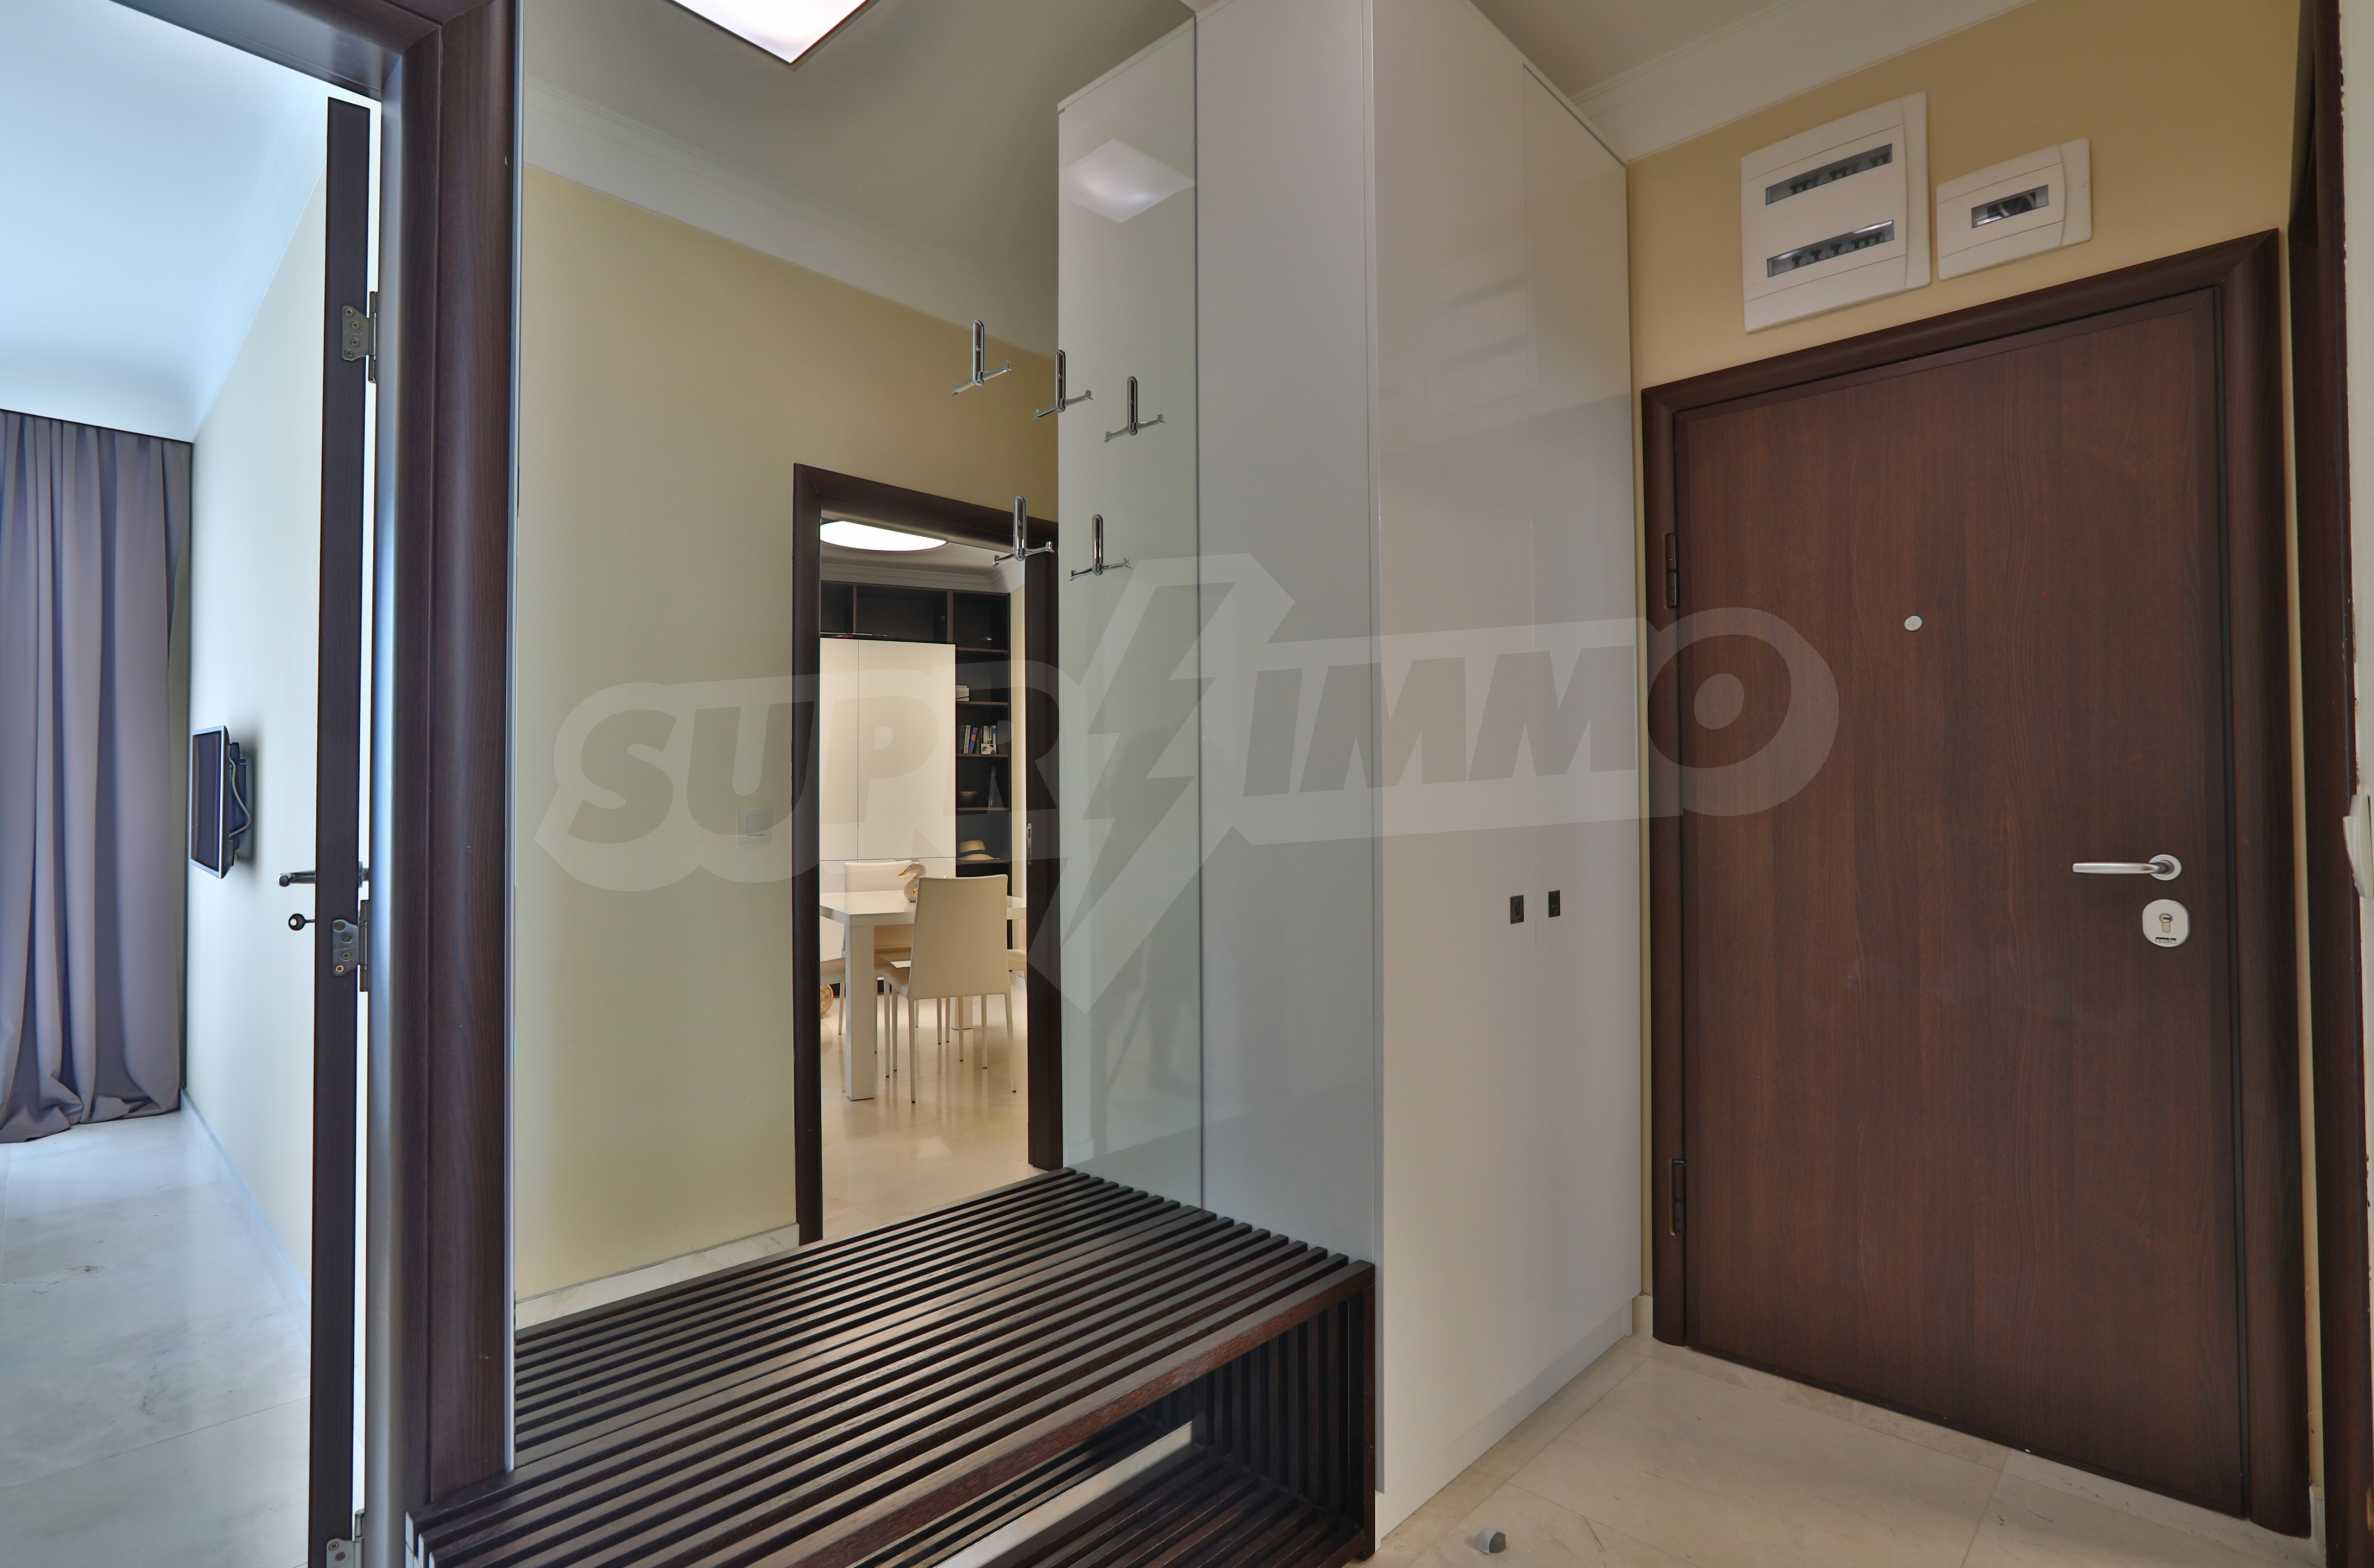 Exclusive 2-bedroom beachfront apartment in the prestigious Belle Époque Beach Residence 25